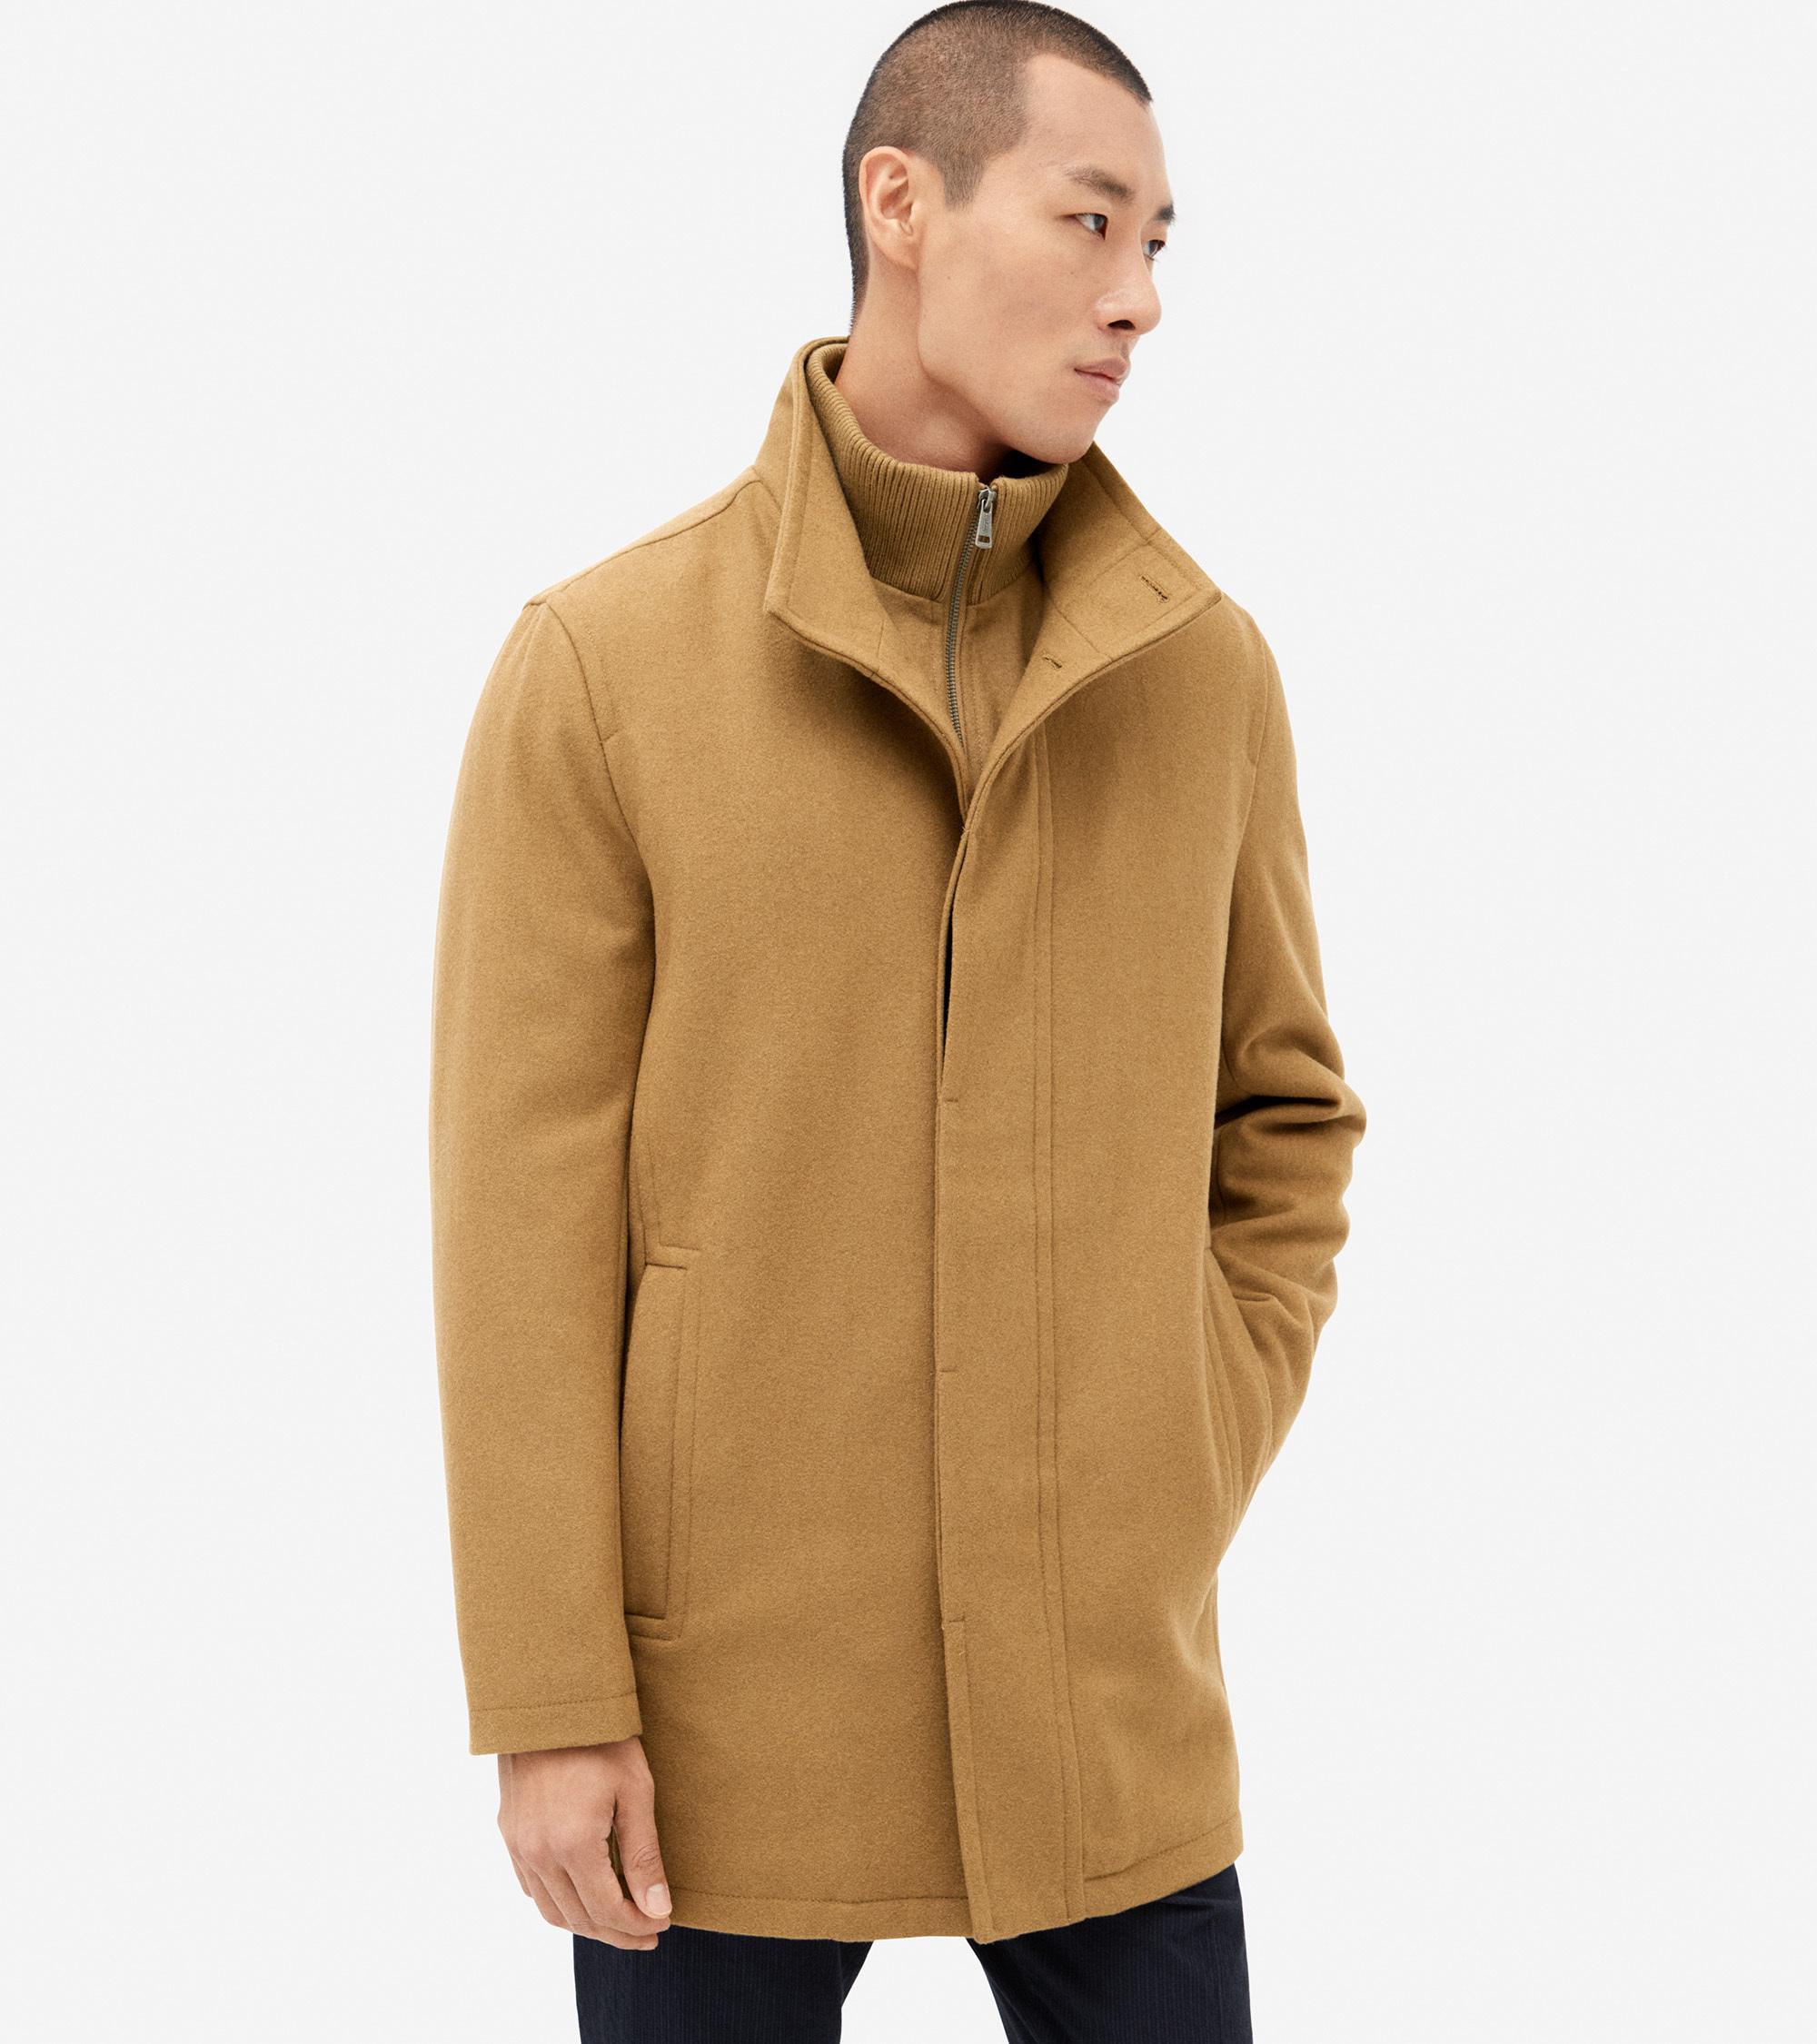 Melton Wool Jacket